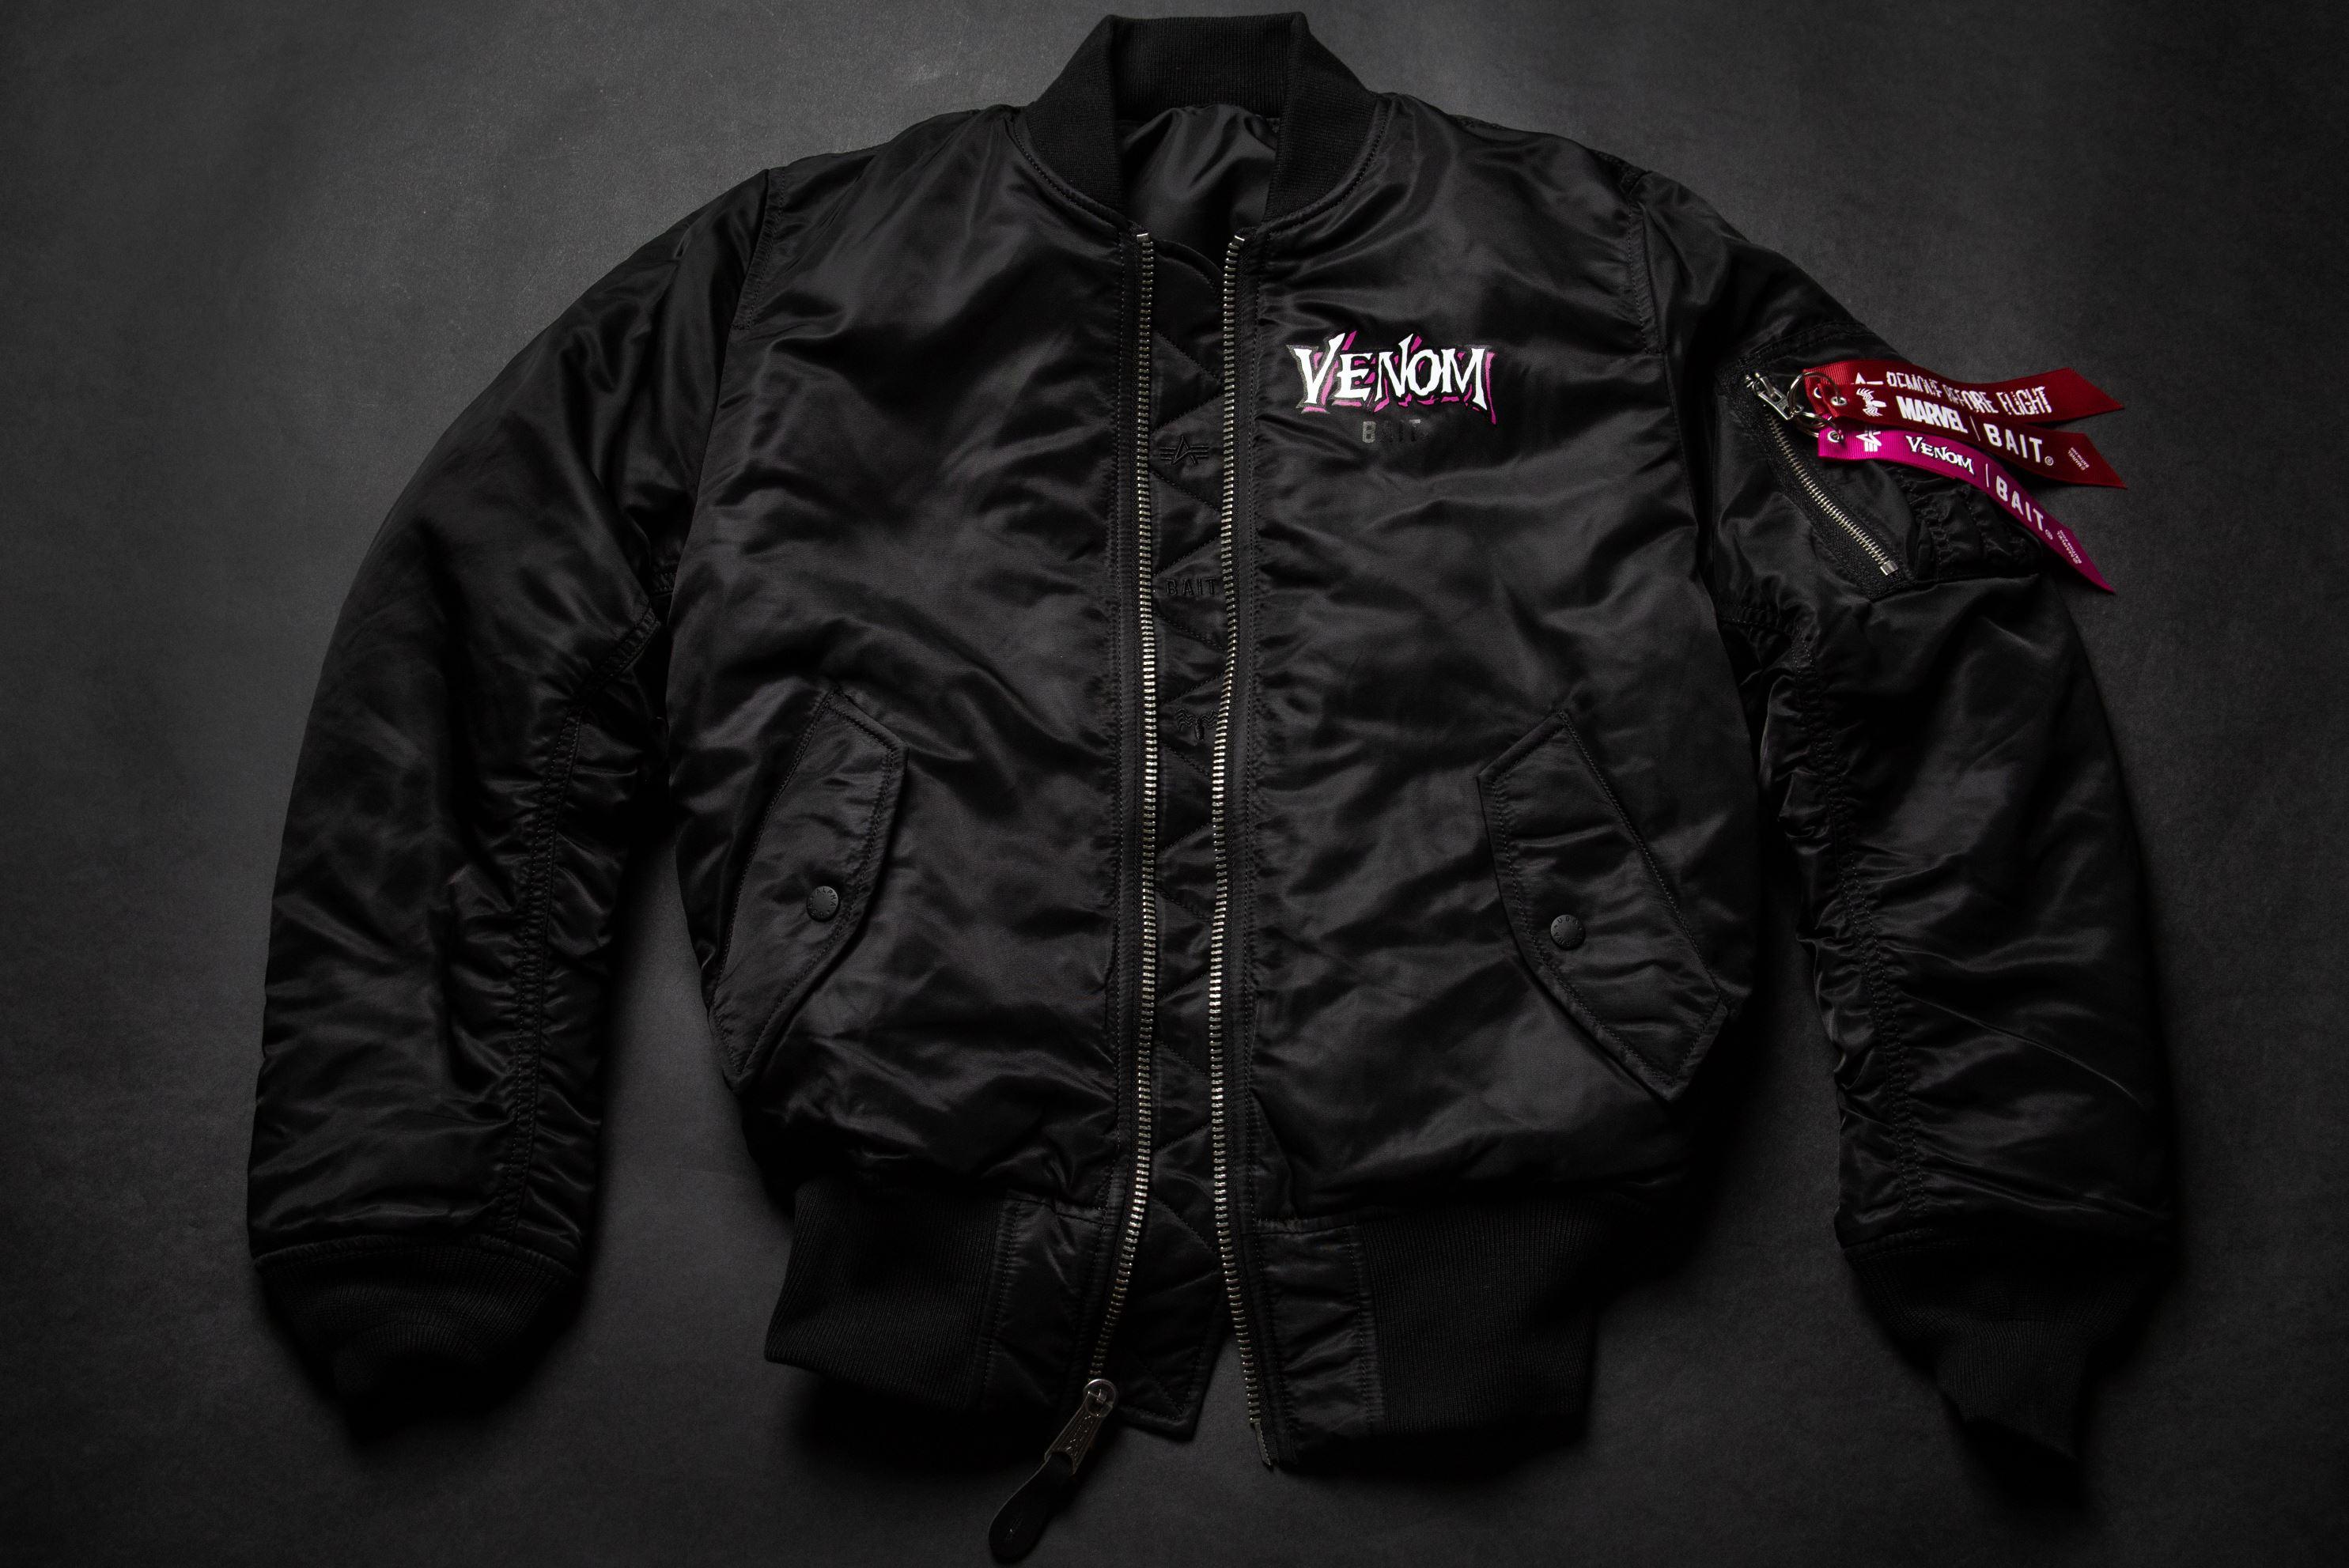 venom jacket bait x alpha industries